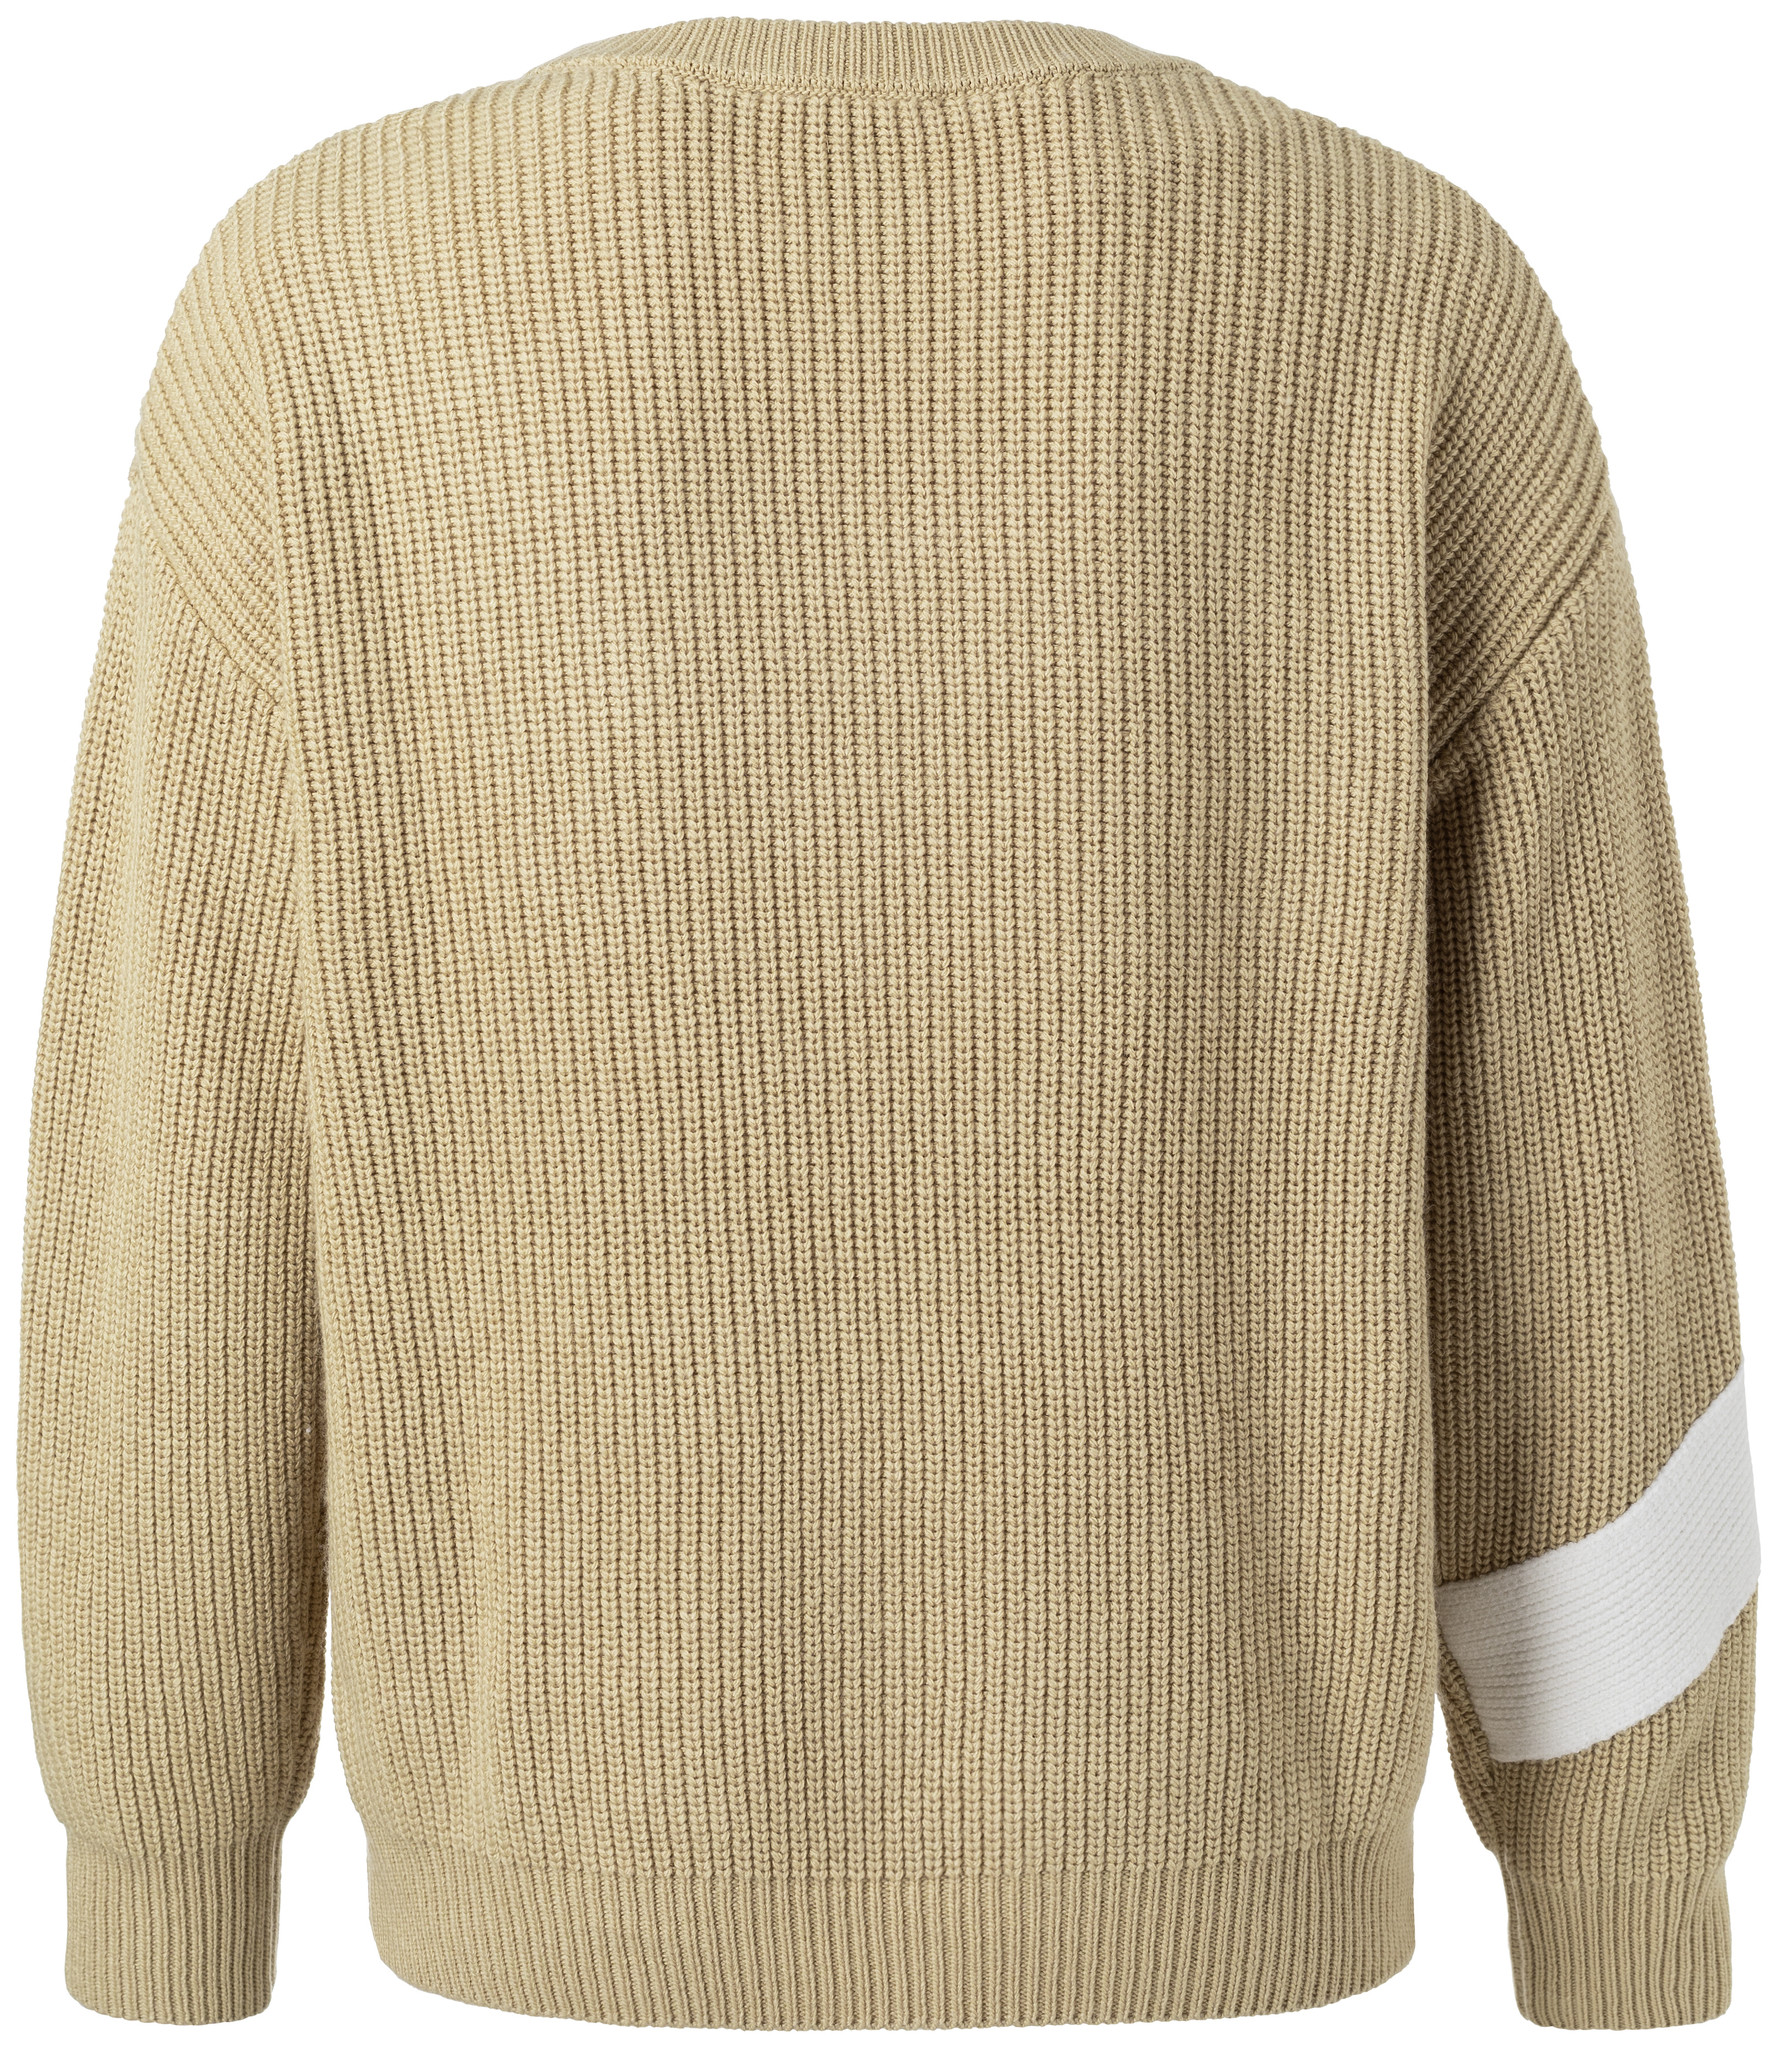 yaya Zig zag sweater 1000389-111-3